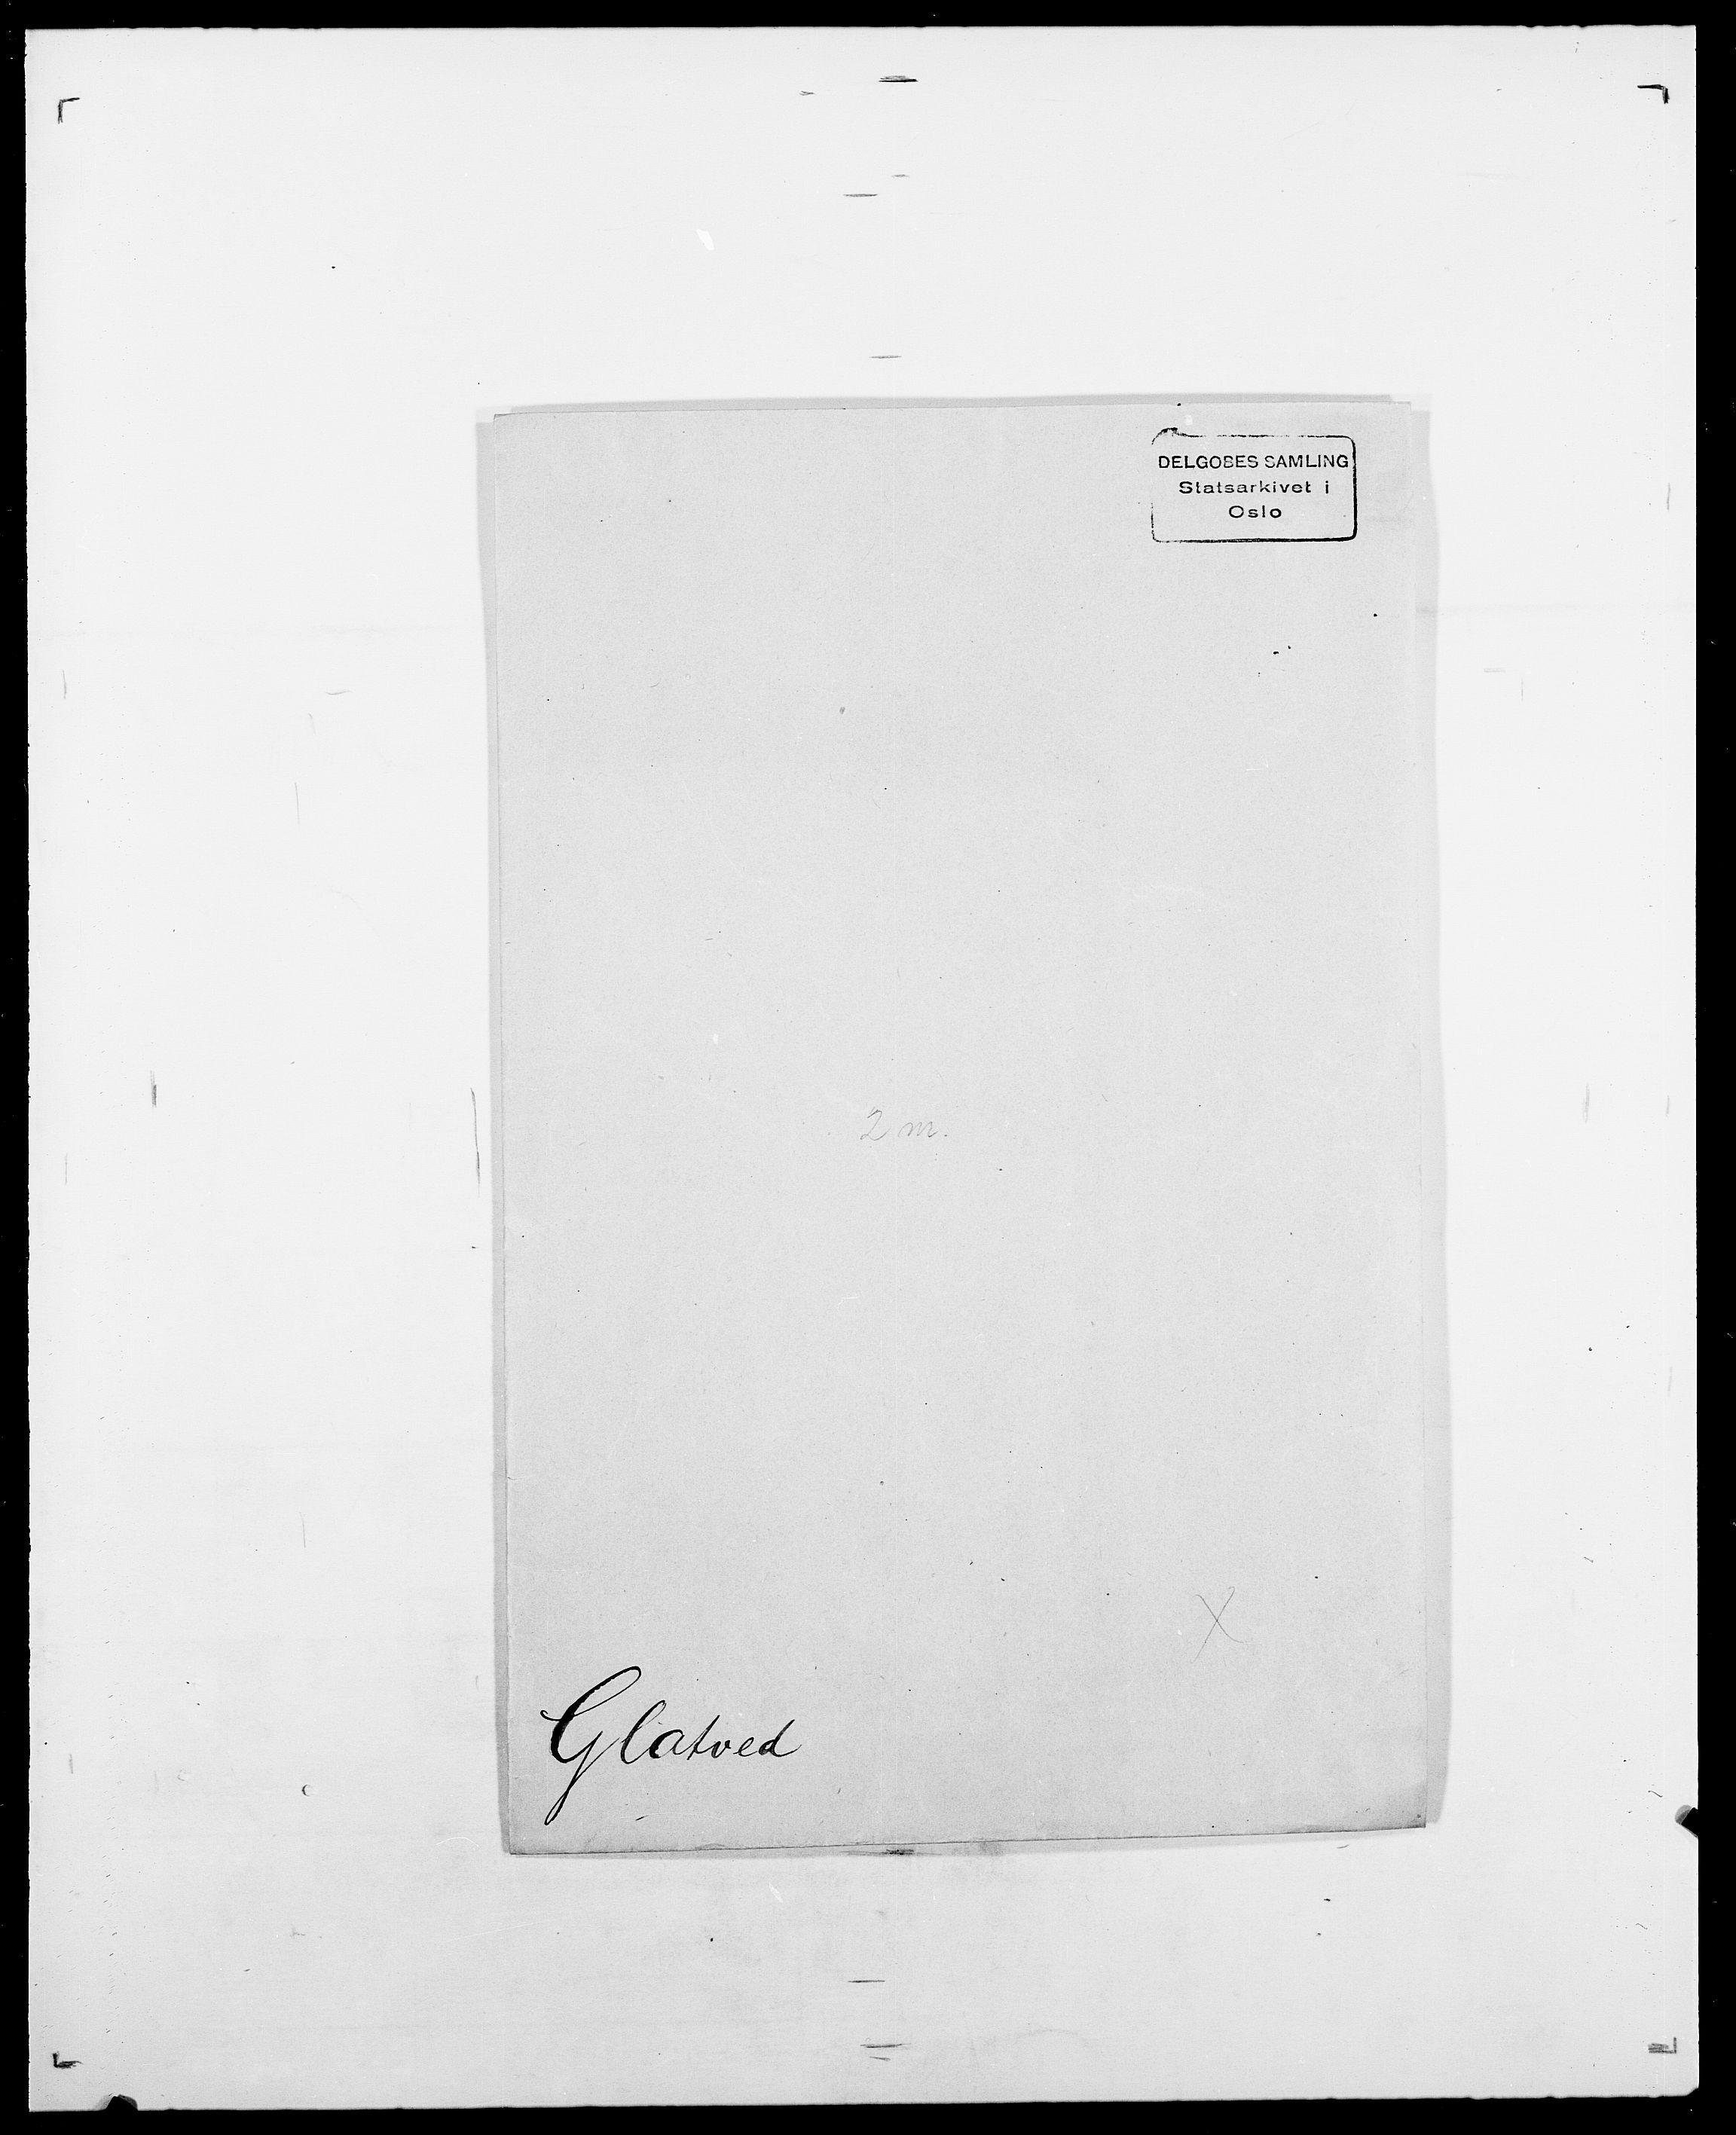 SAO, Delgobe, Charles Antoine - samling, D/Da/L0014: Giebdhausen - Grip, s. 300